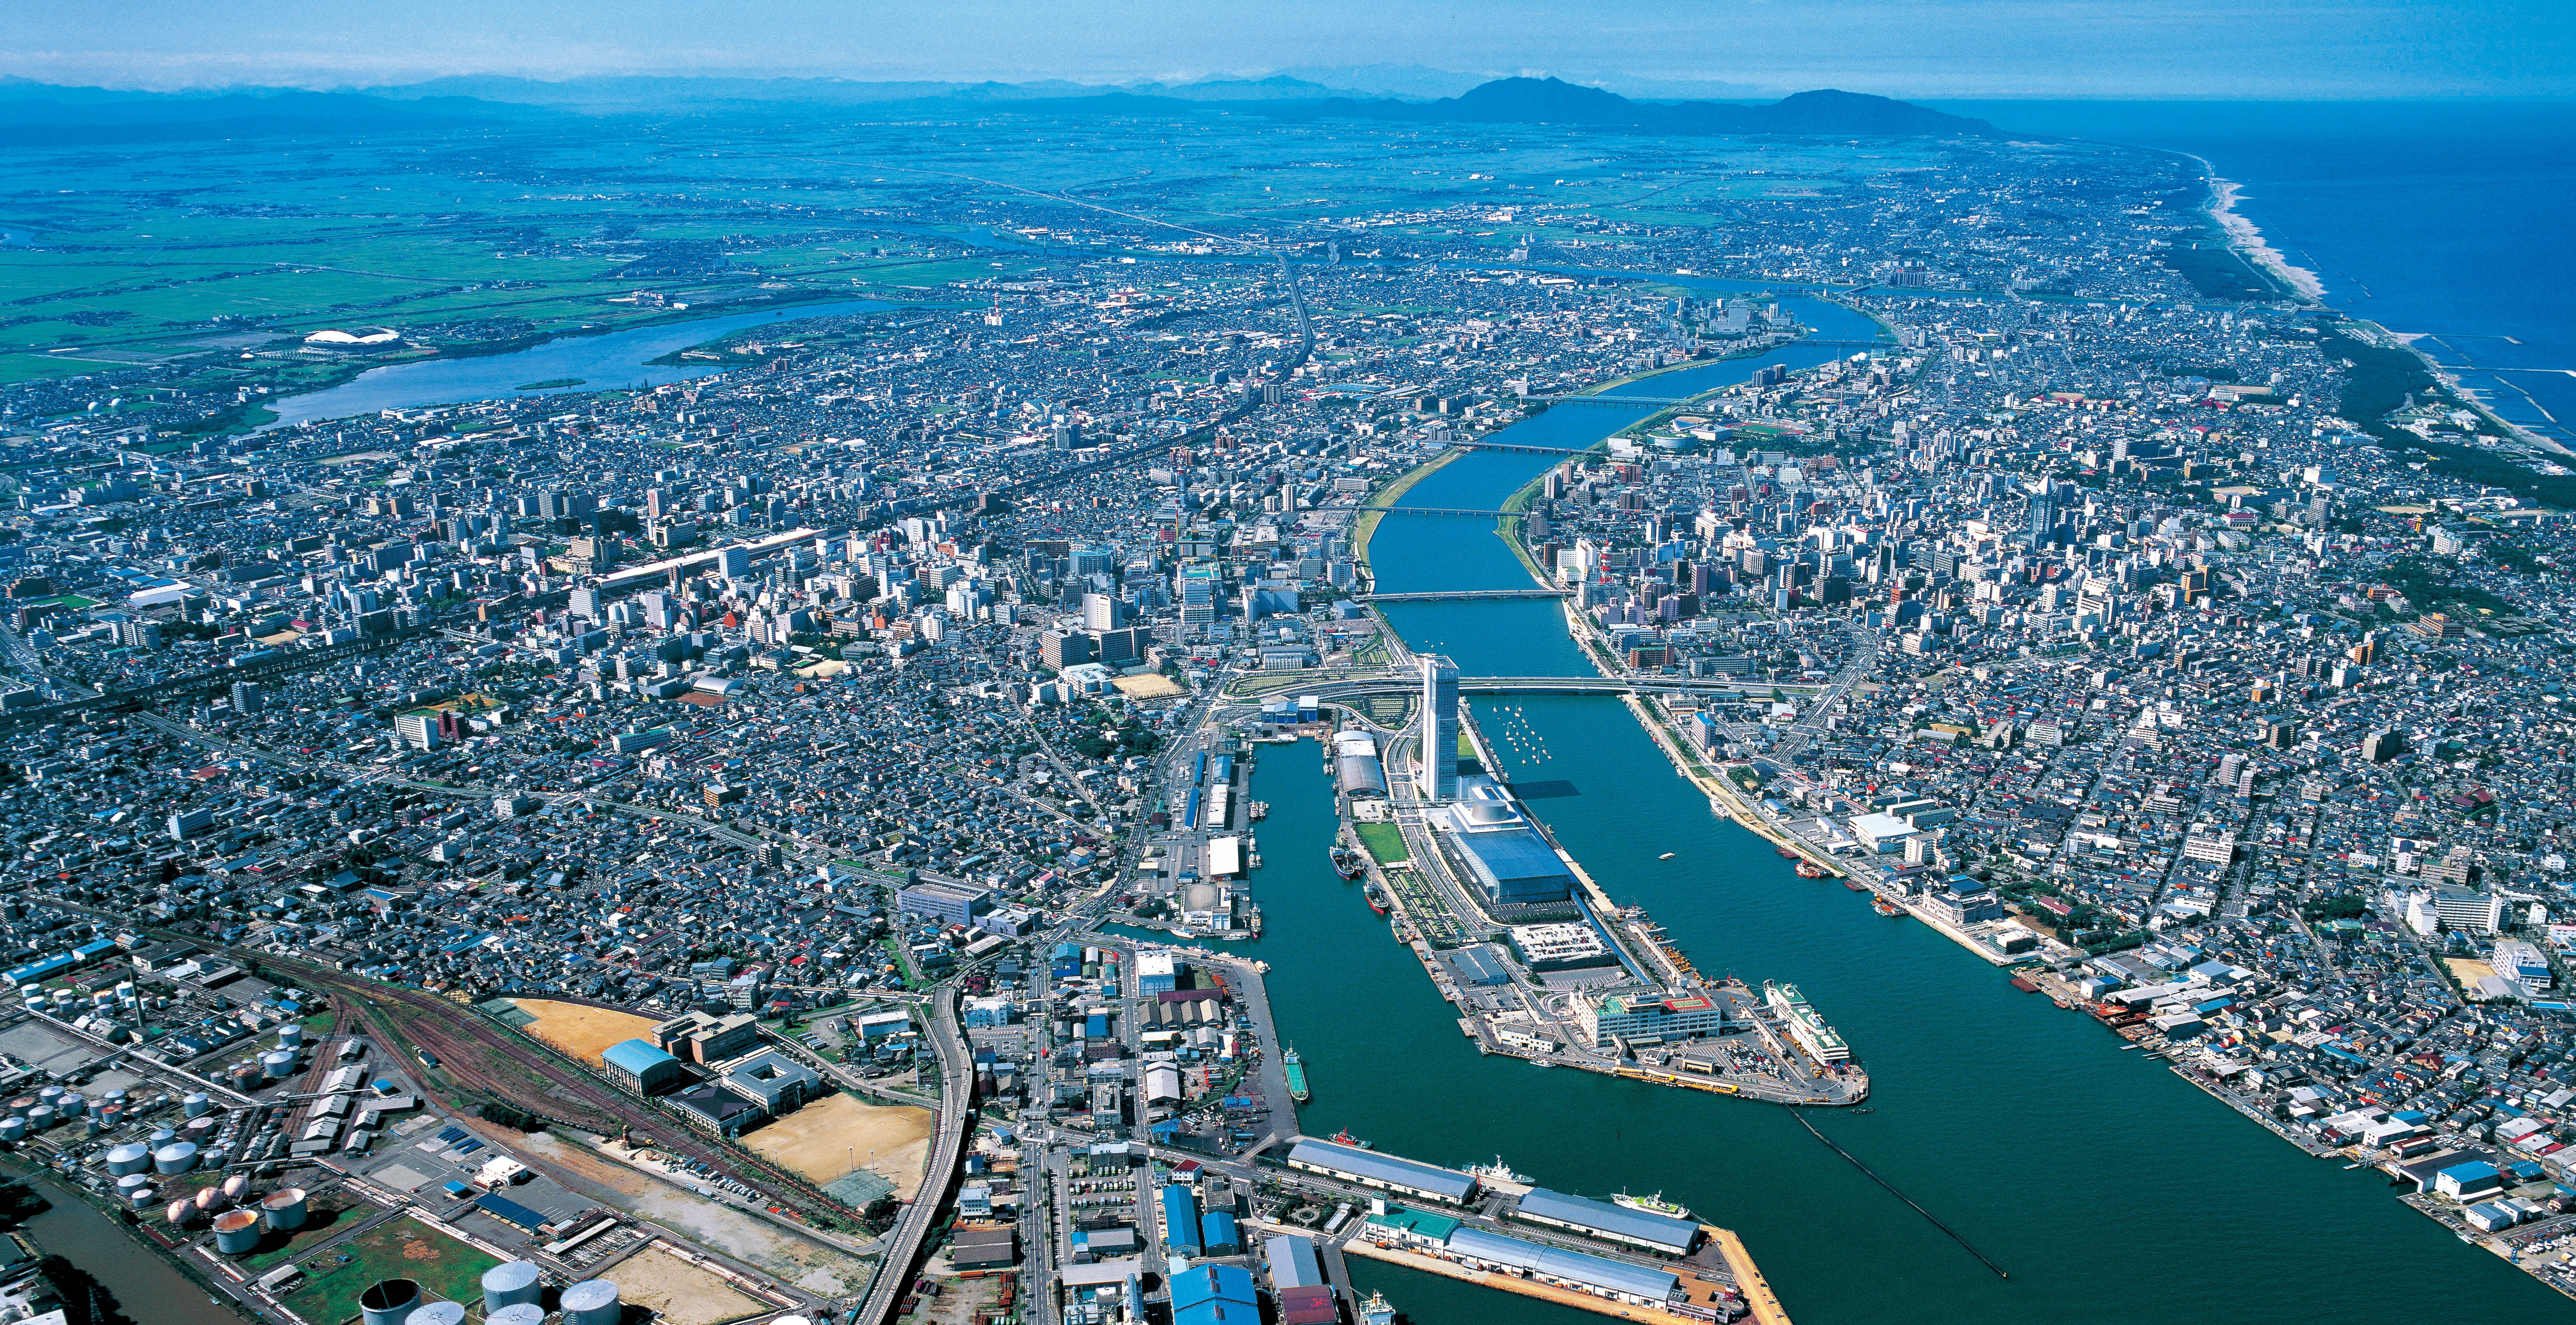 地図 信濃 川 きく川(地図/長野市/日本料理)